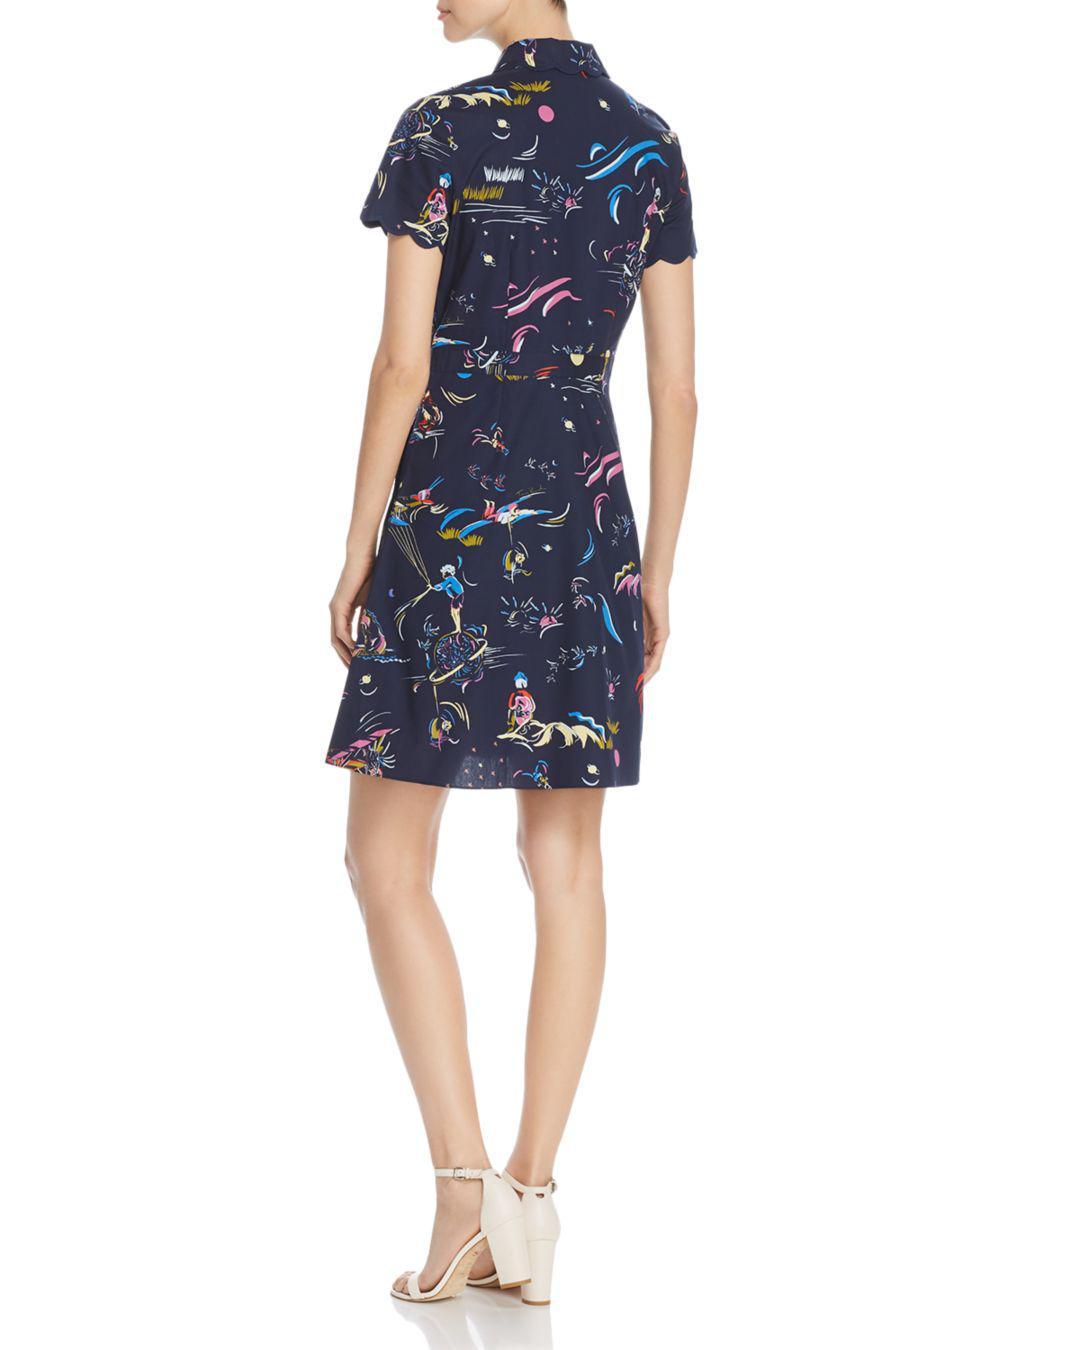 7305882cdf Tory Burch Printed Scallop-edged Shirtdress in Blue - Lyst